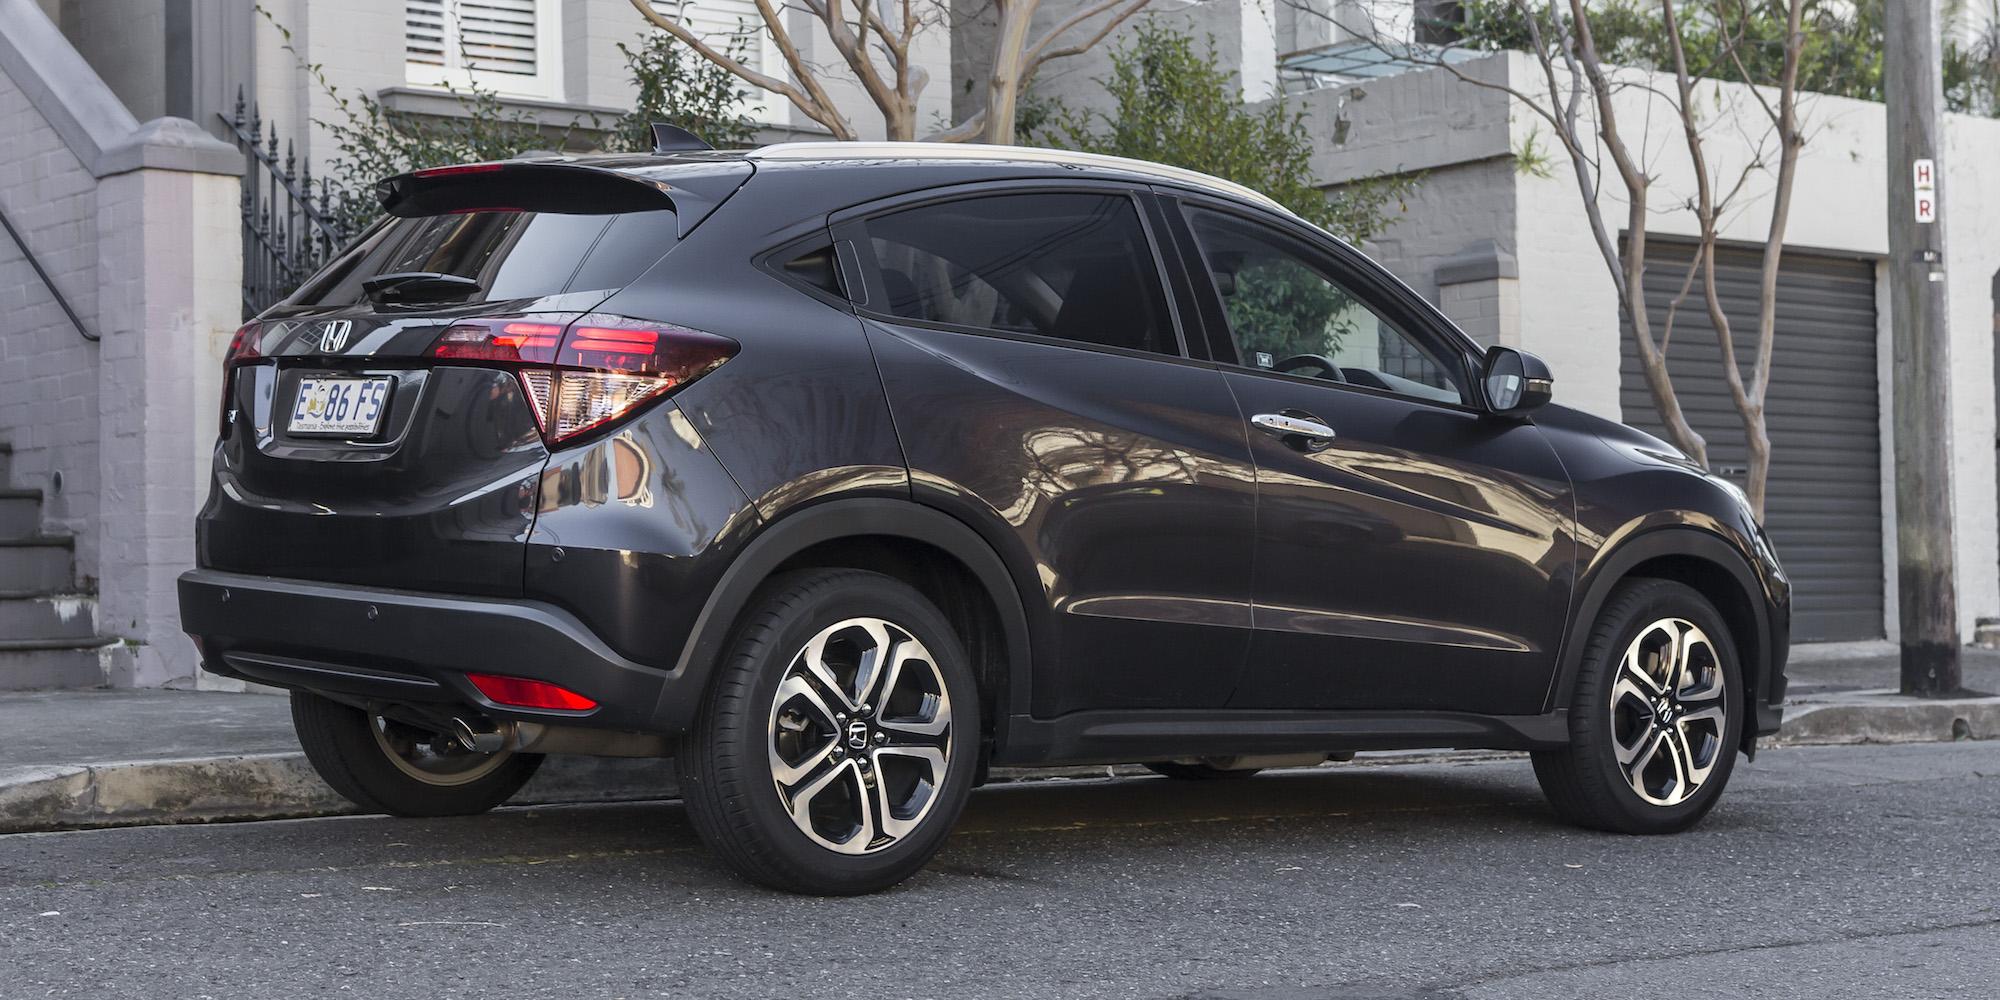 2015 Honda HR V VTi L Review Long term report one